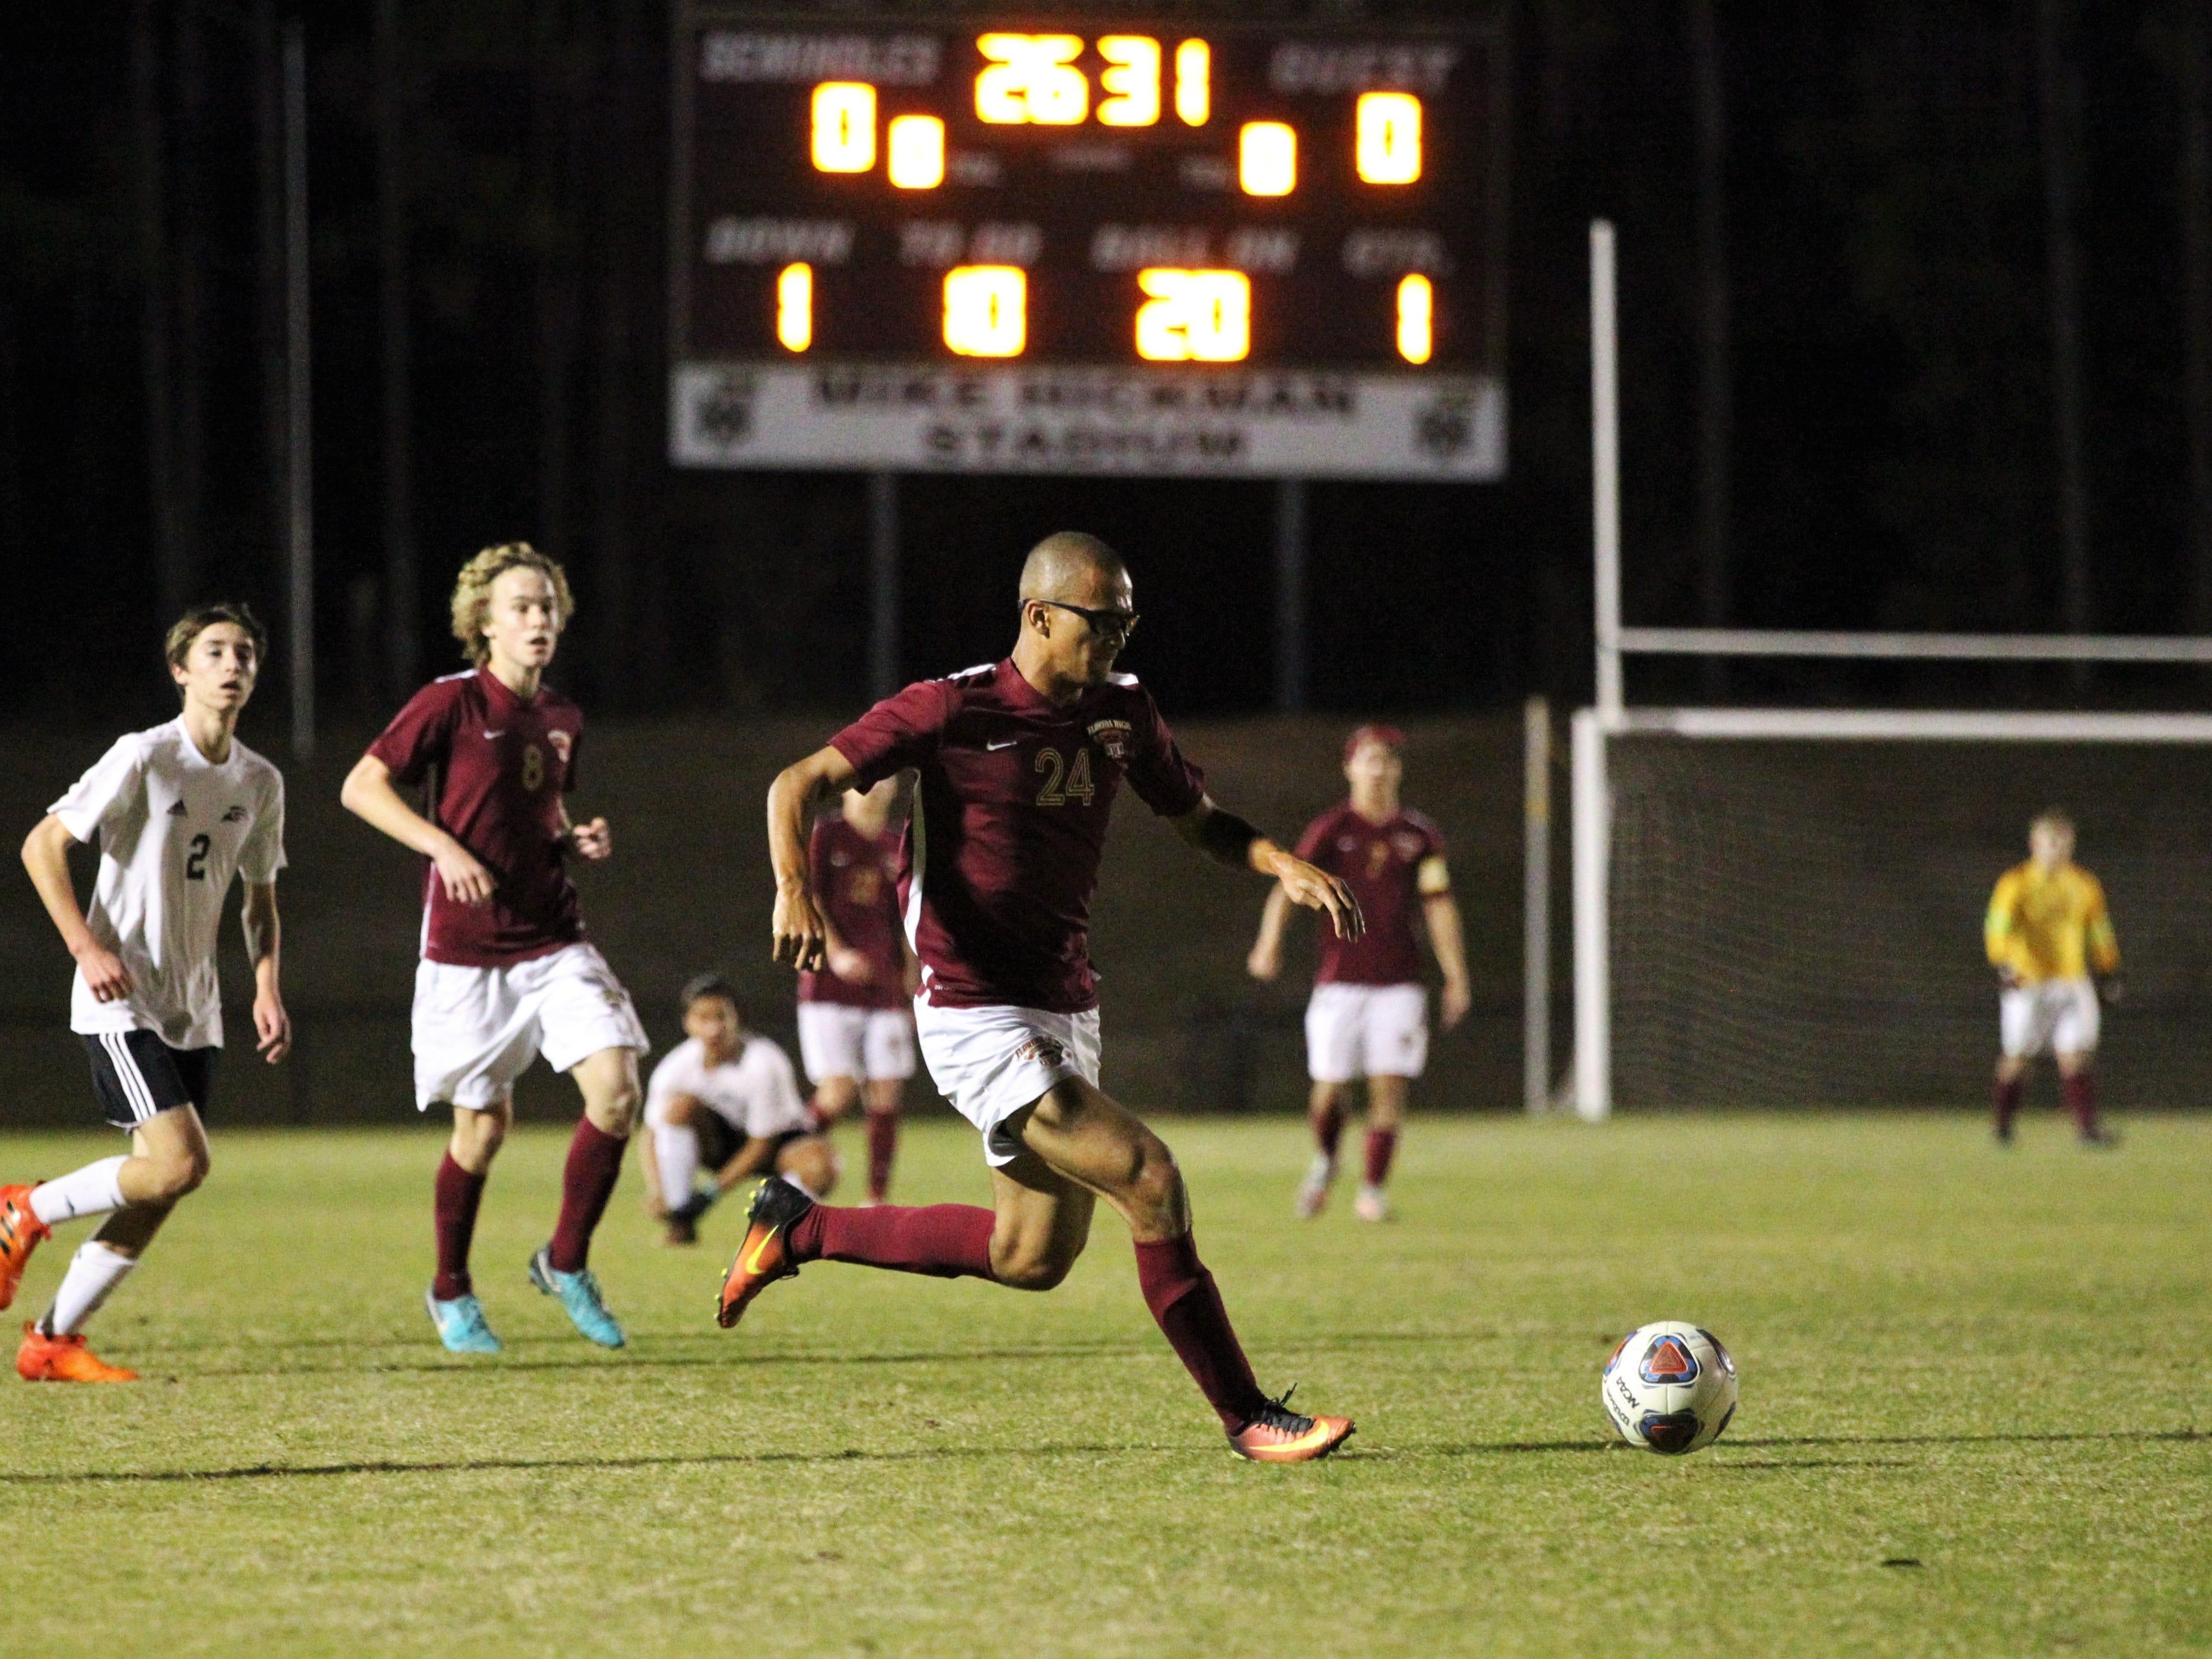 Florida High's Kelan Simmons races upfield as Florida High's boys soccer team beat South Walton 2-0 during a Region 1-2A quarterfinal on Feb. 6, 2018.